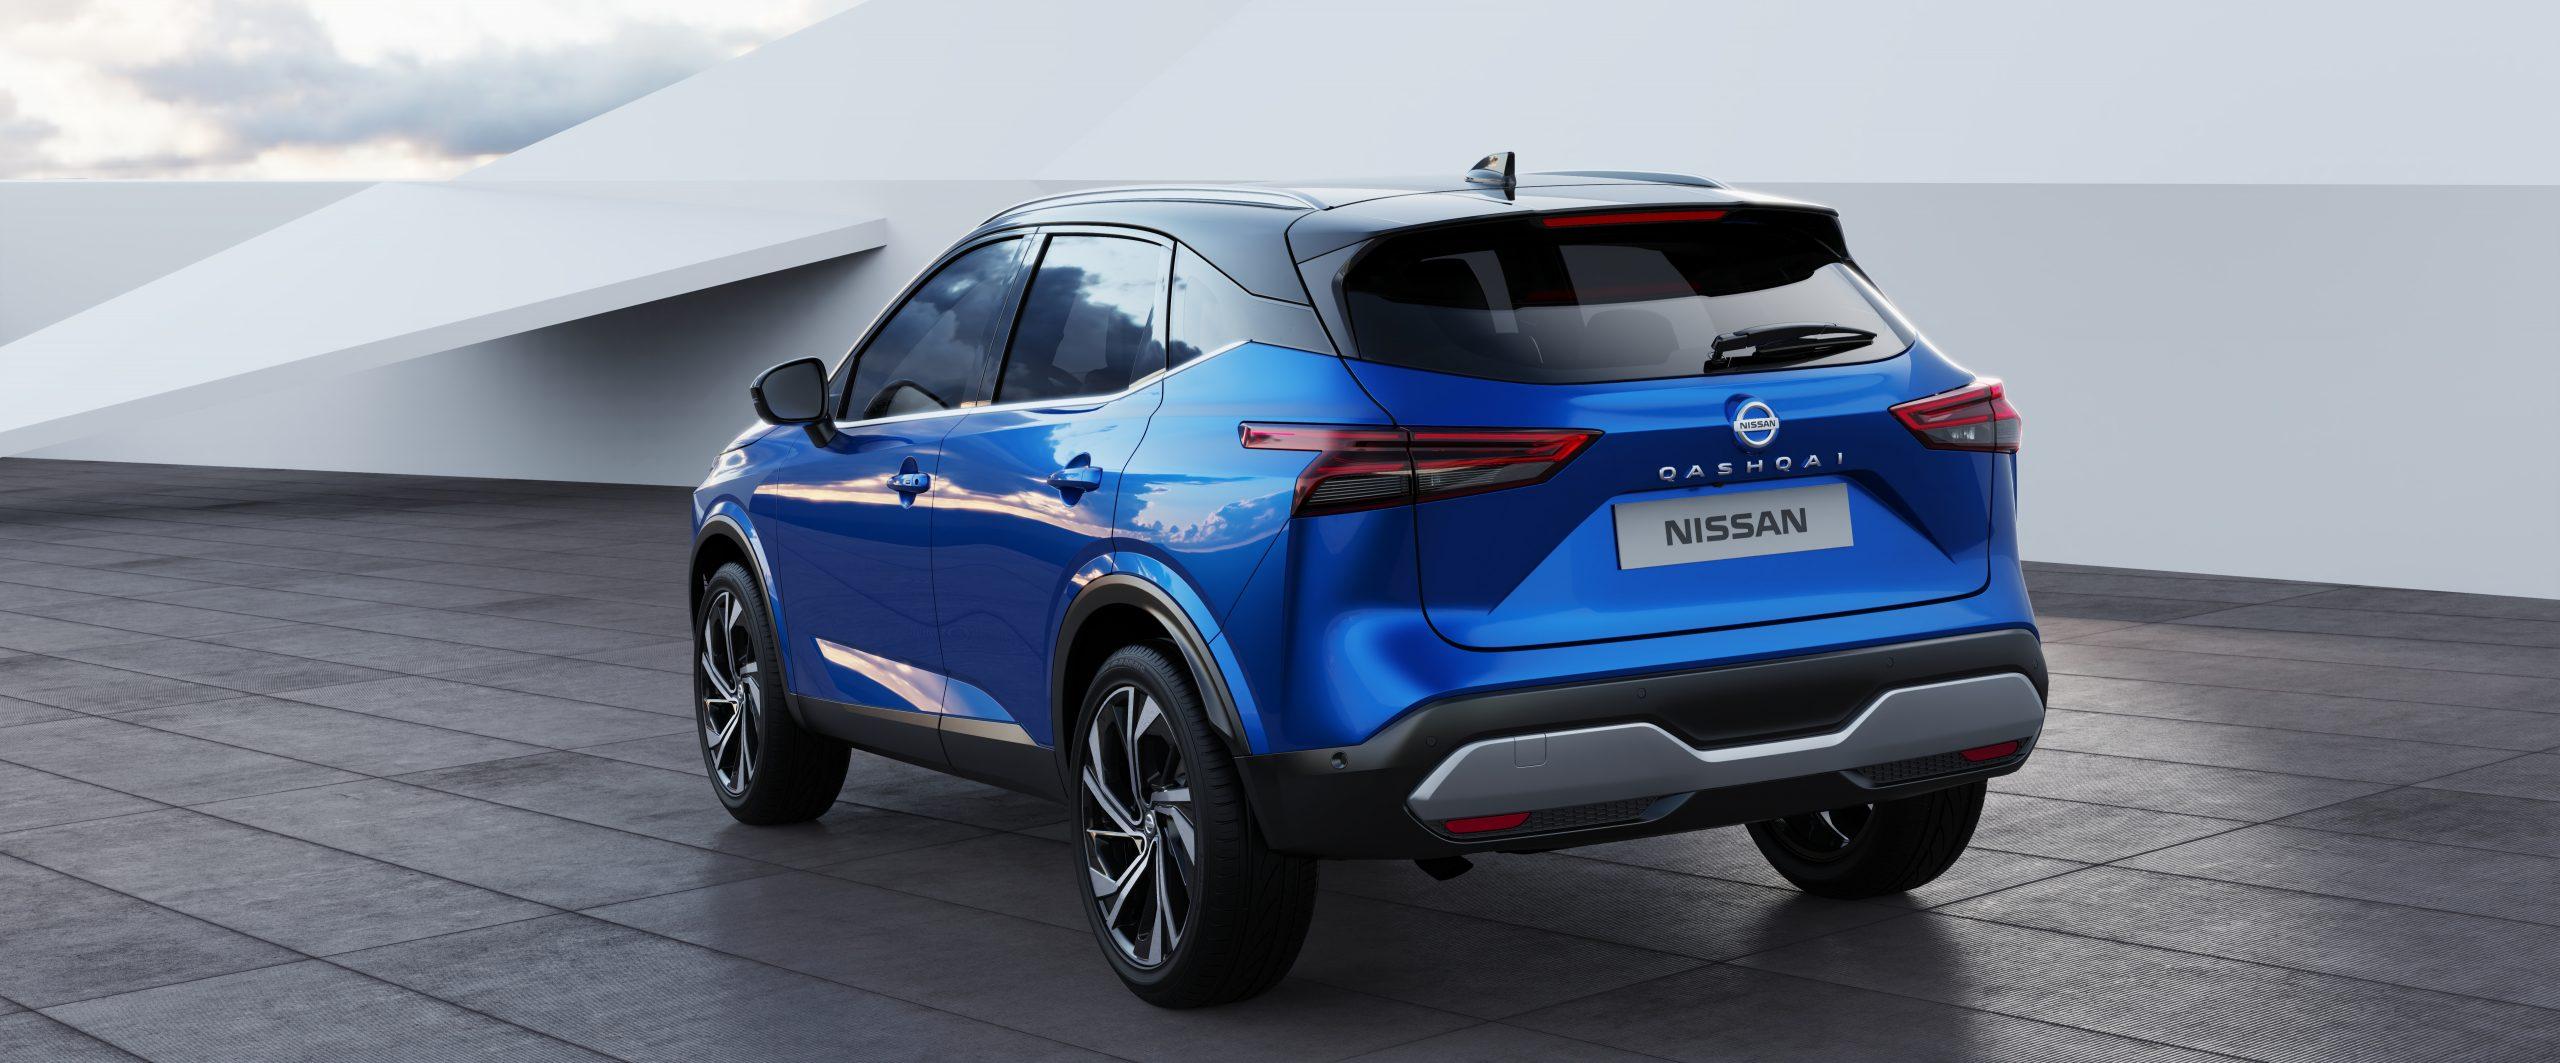 Noul Nissan Qashqai (21)